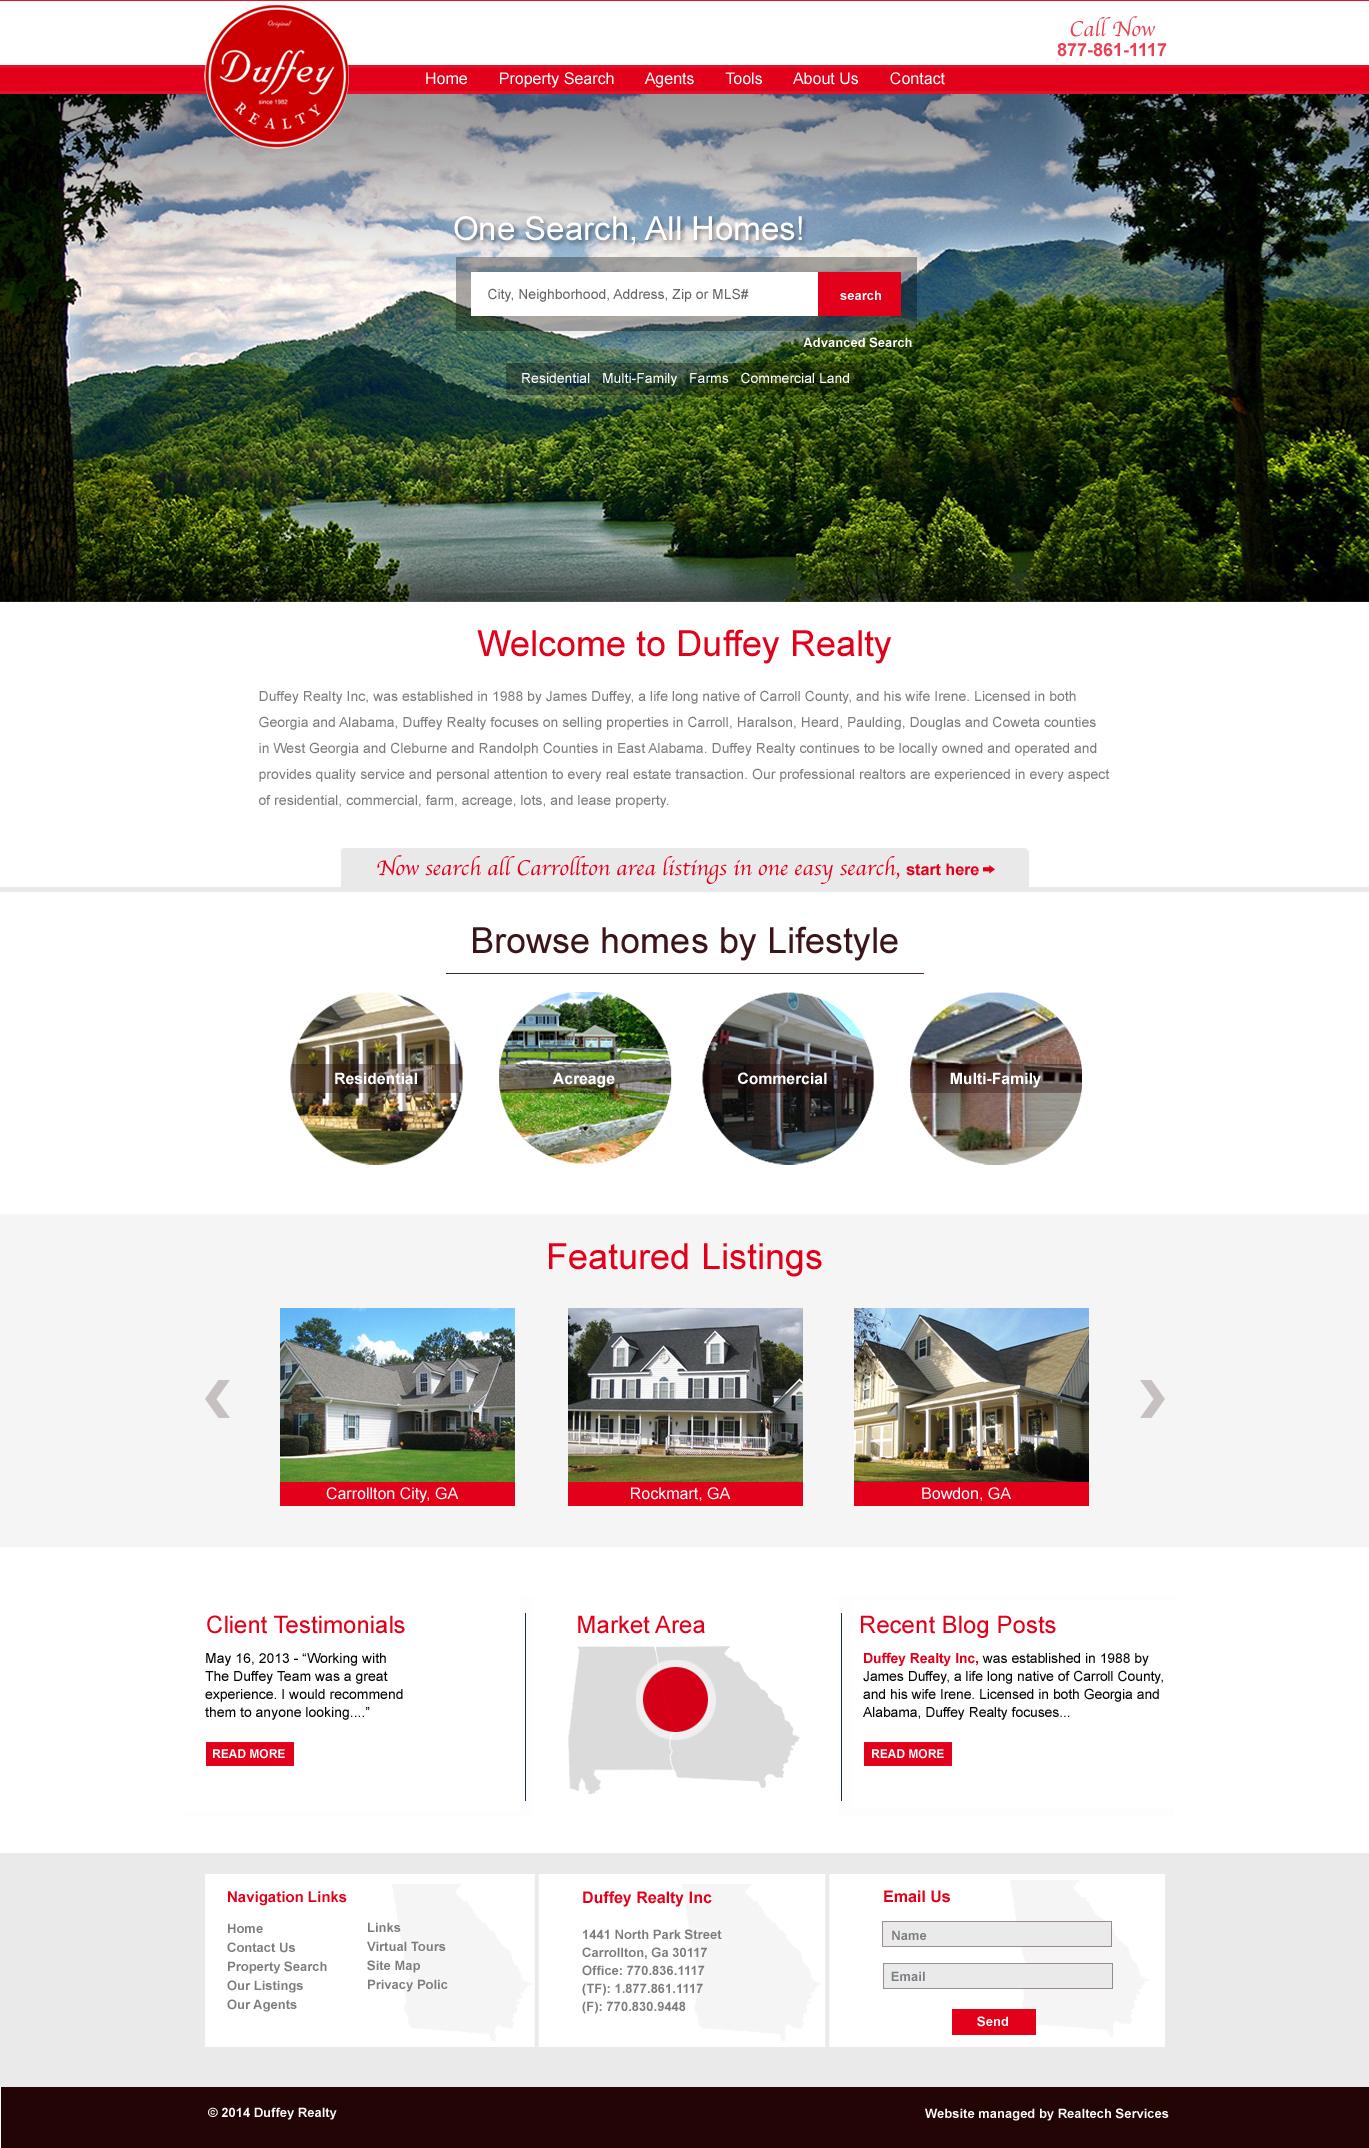 Duffey Realty image 3